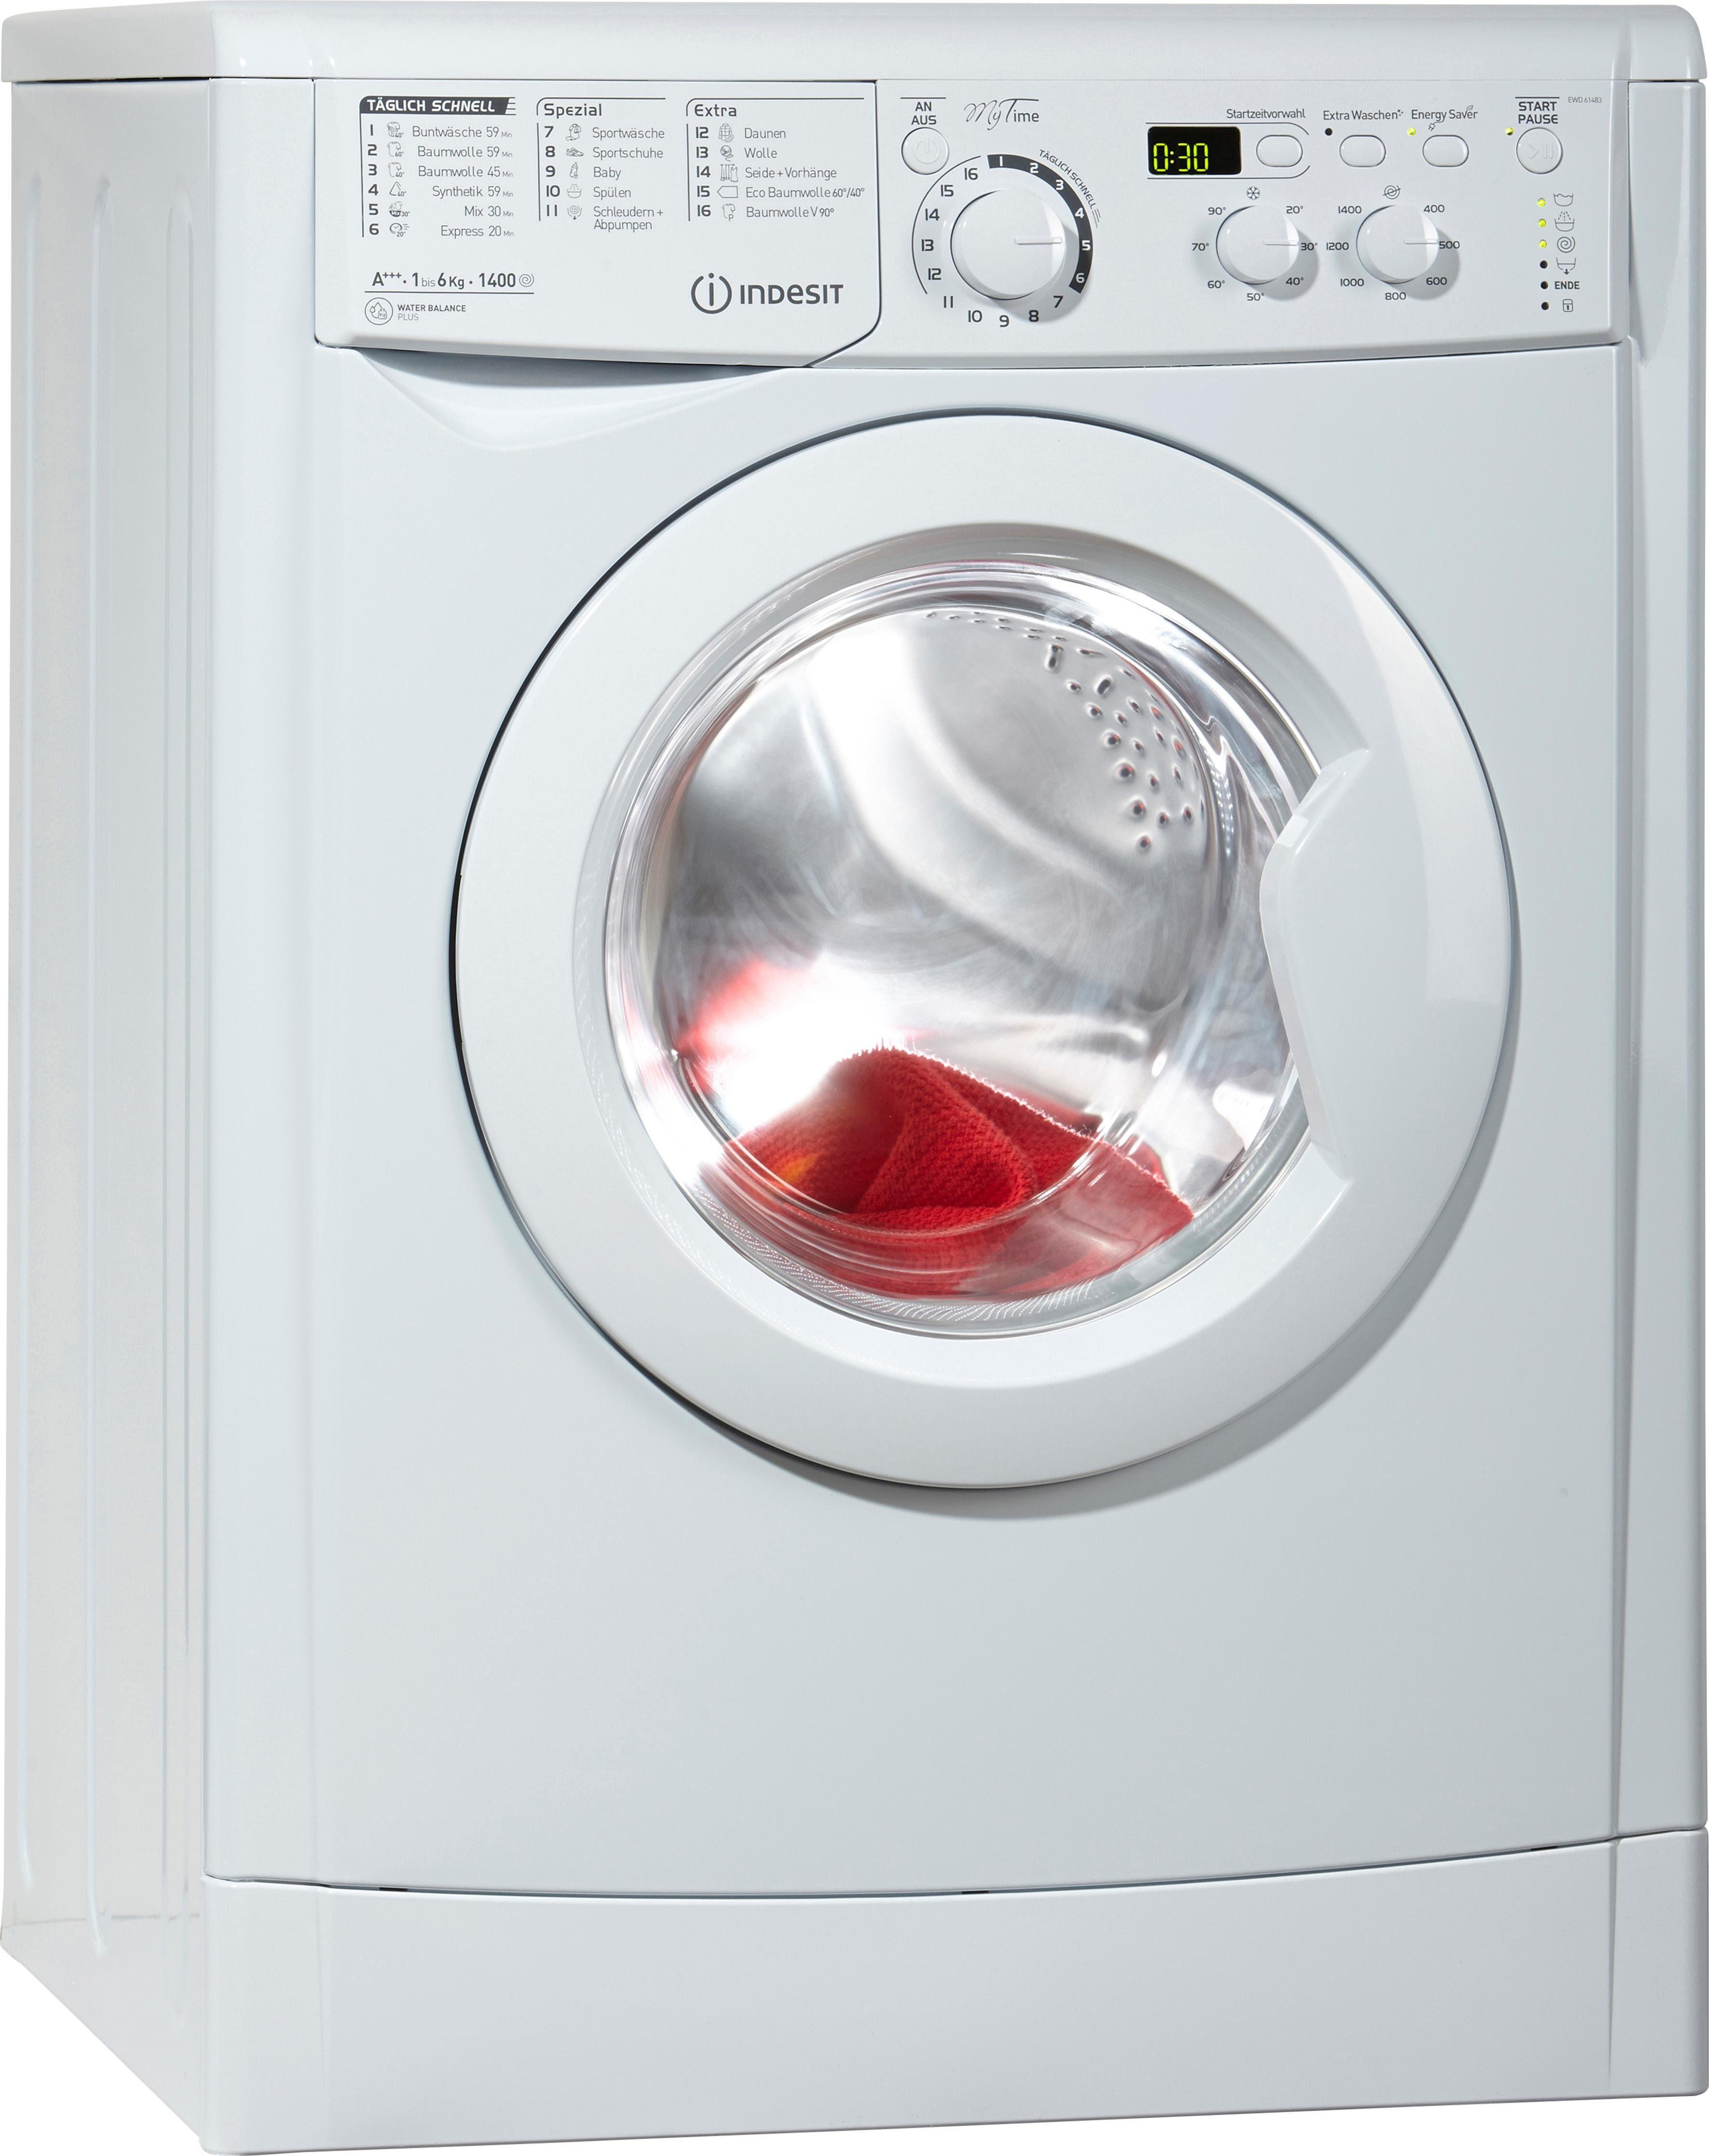 Indesit Waschmaschine EWD 61483 W DE, A+++, 6 kg, 1400 U/Min